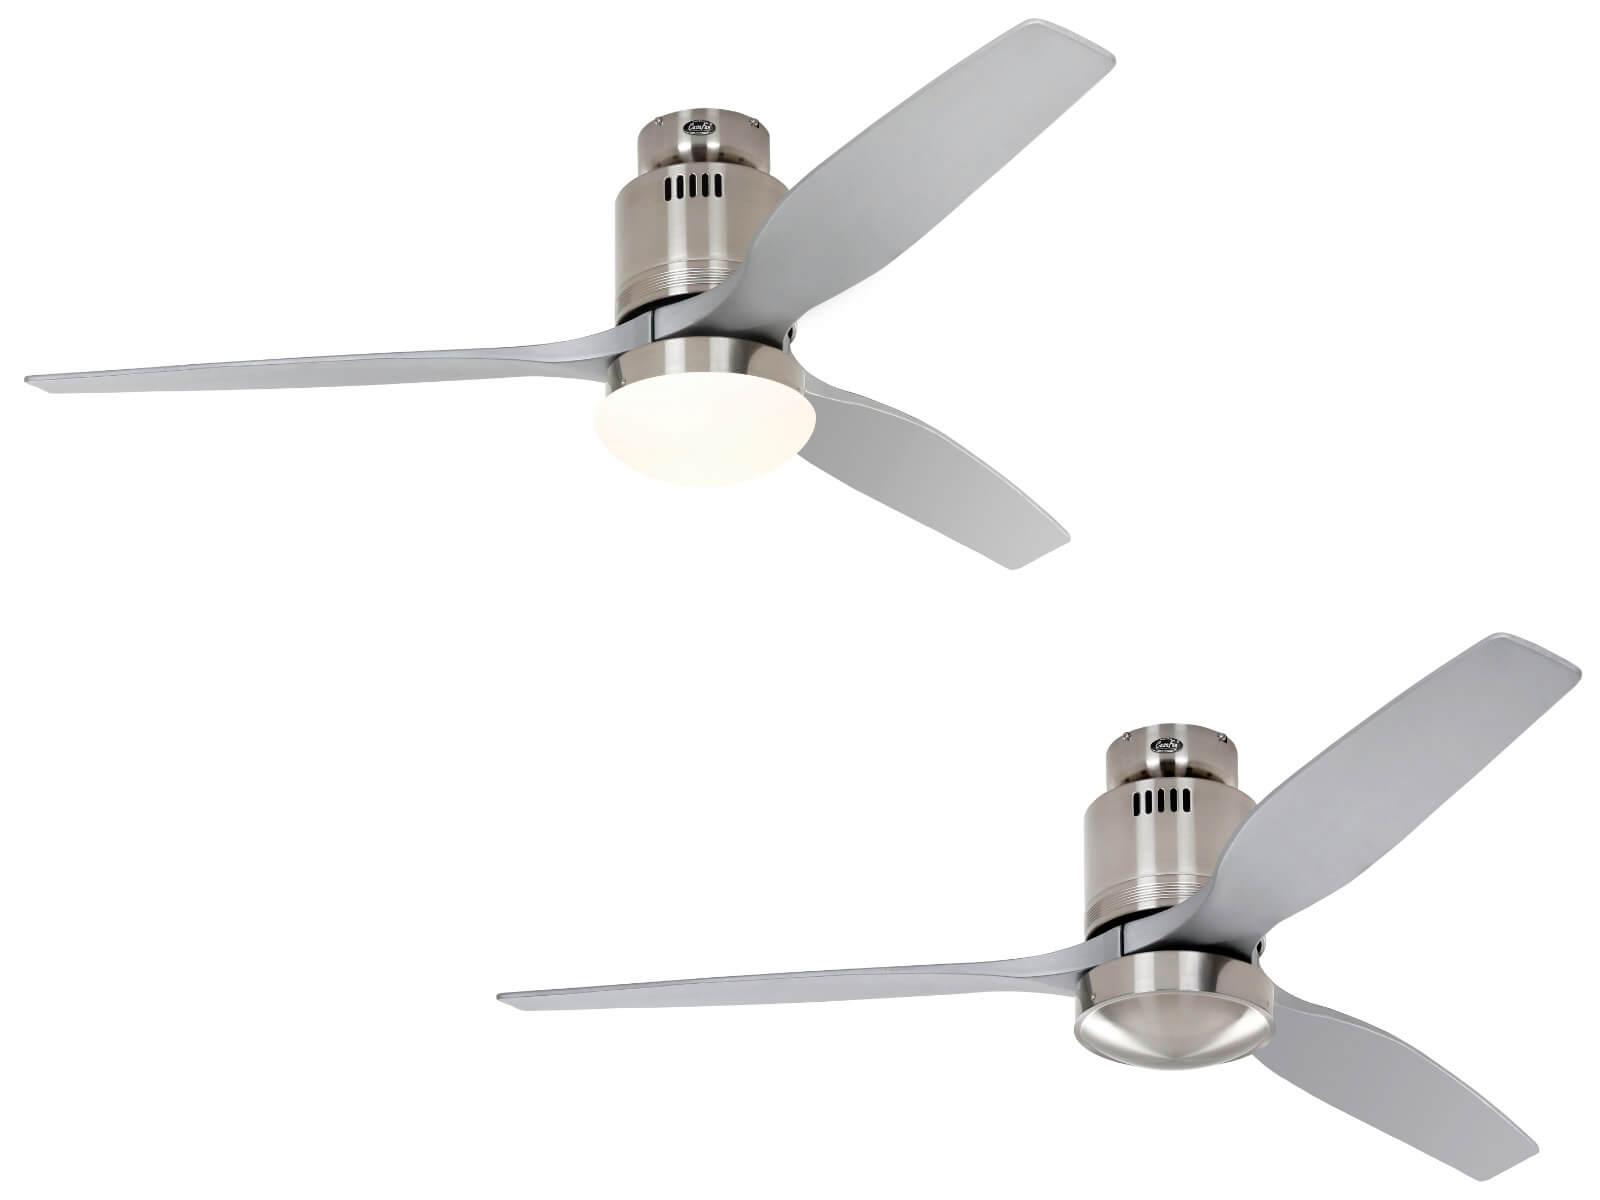 Dc Ceiling Fan Aerodynamix Eco Brushed Chrome Silver